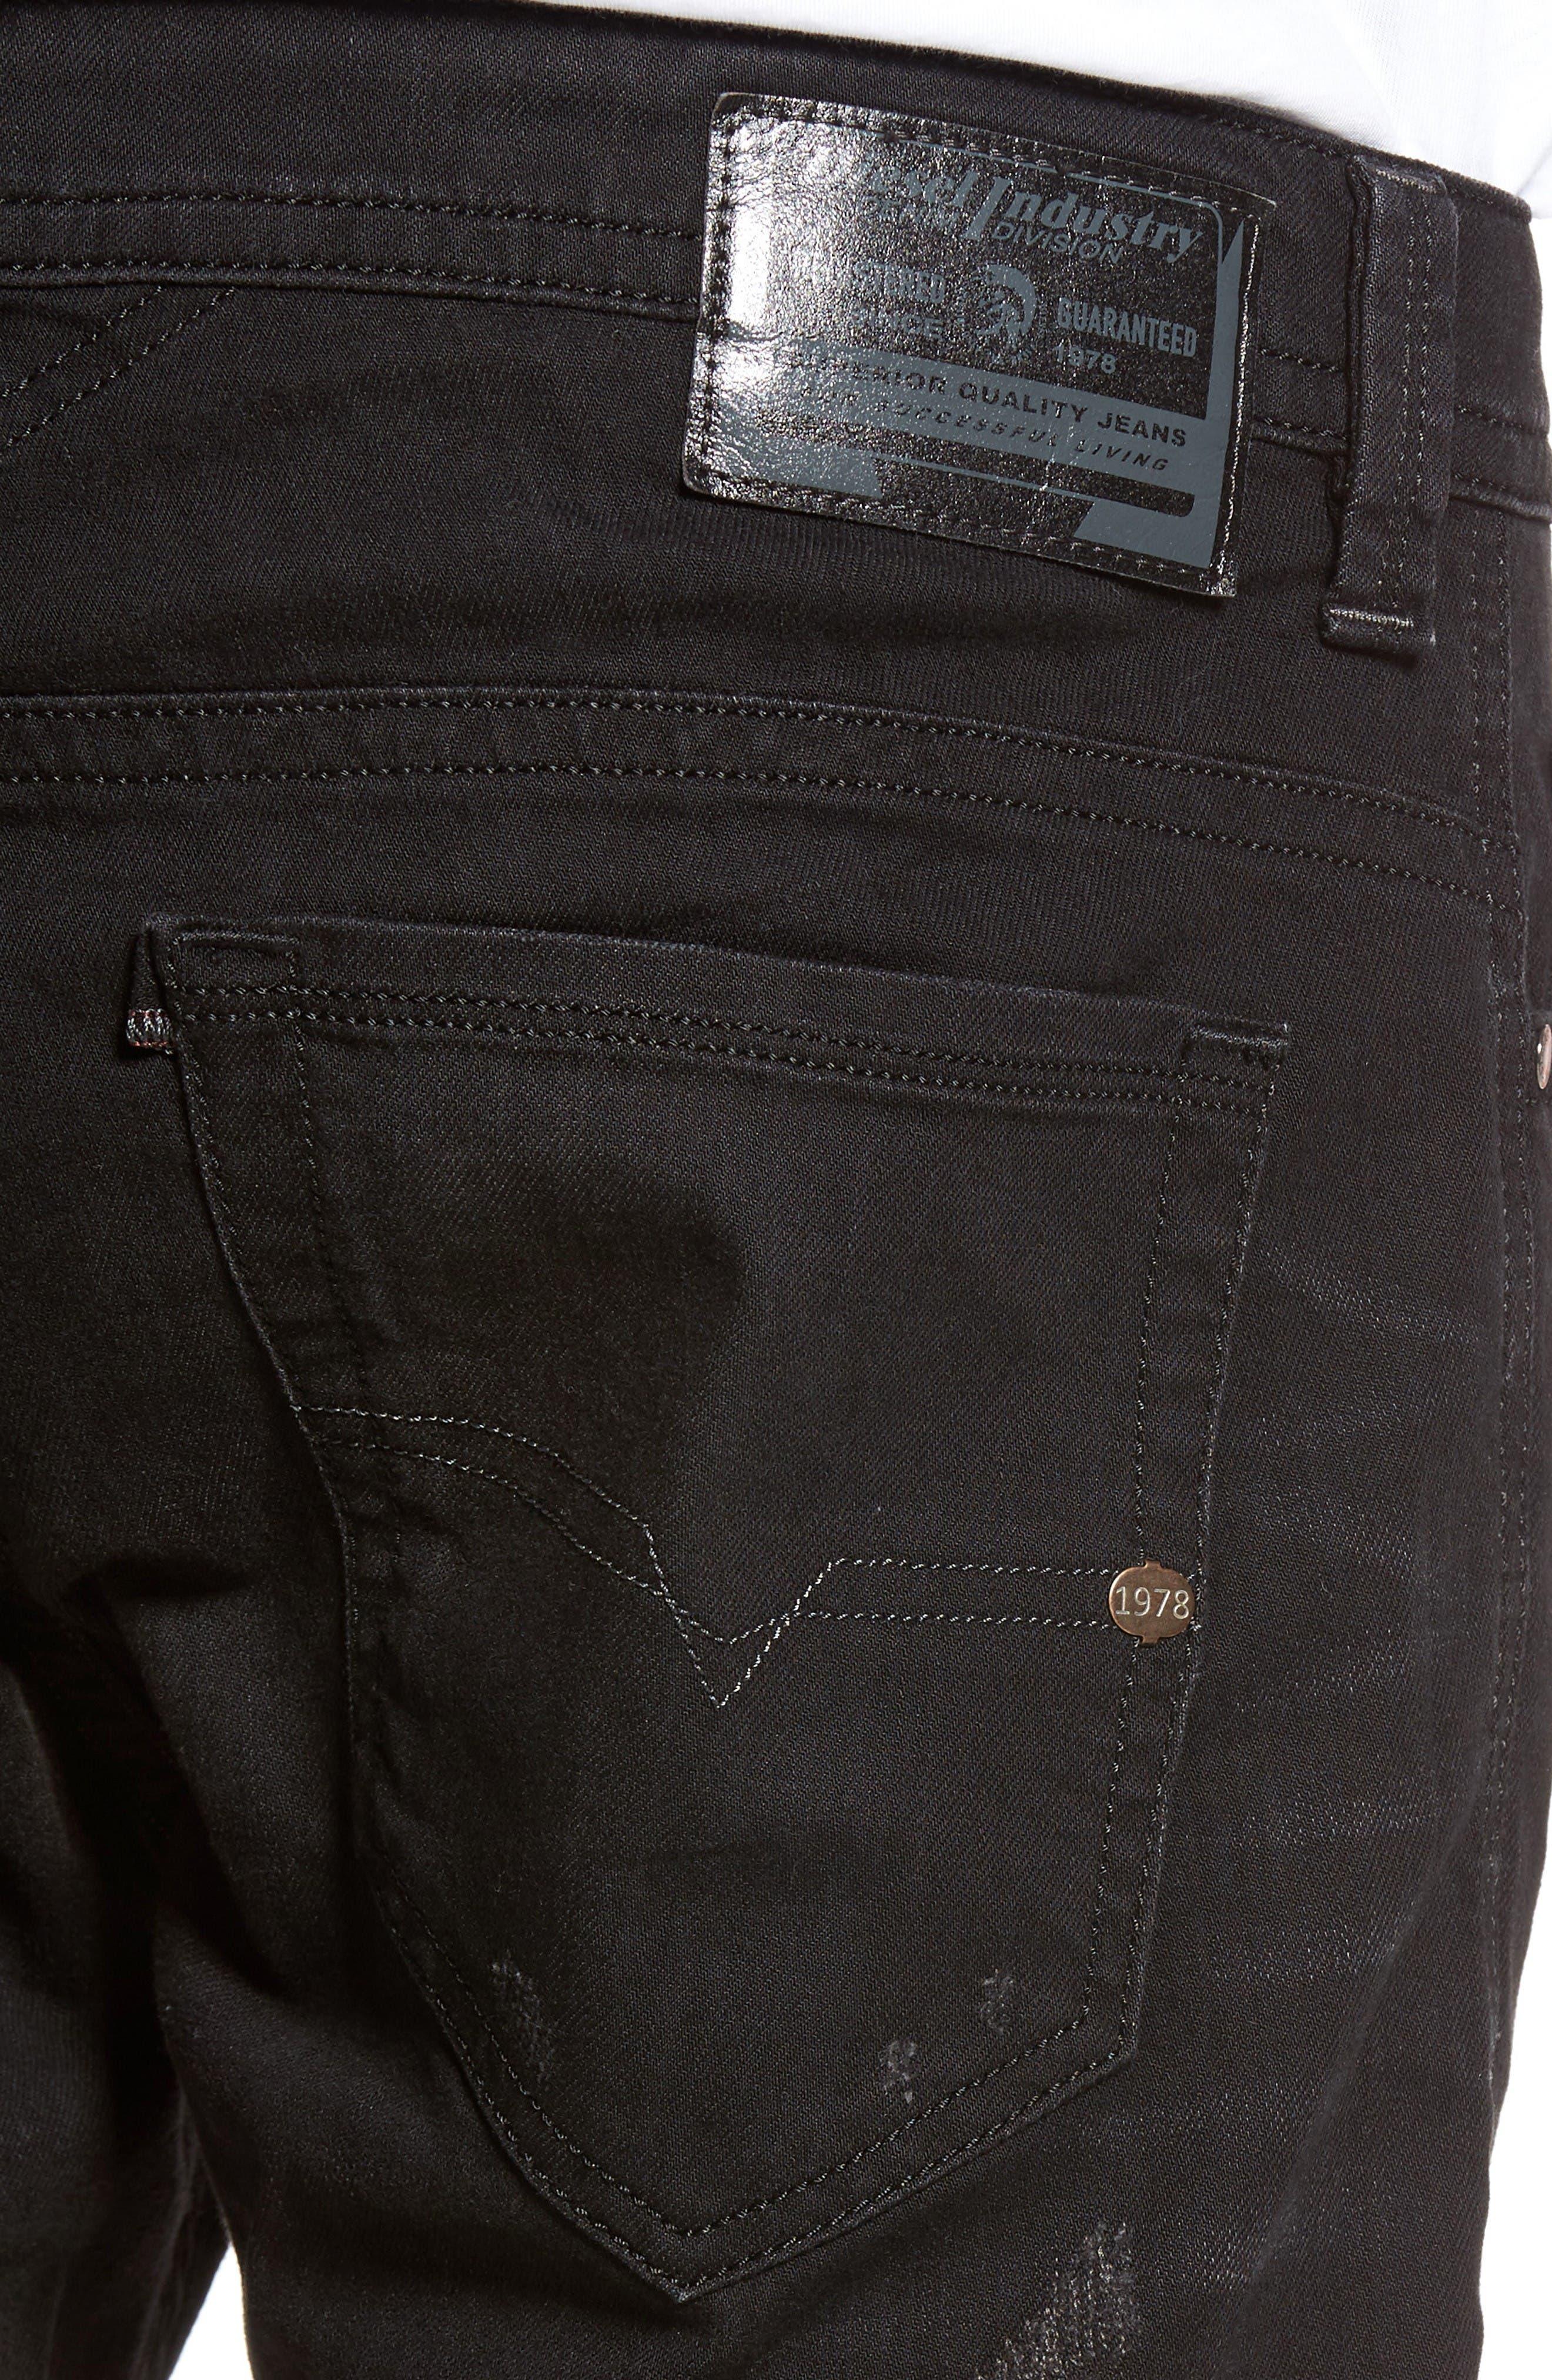 Thavar Skinny Fit Jeans,                             Alternate thumbnail 4, color,                             0679F